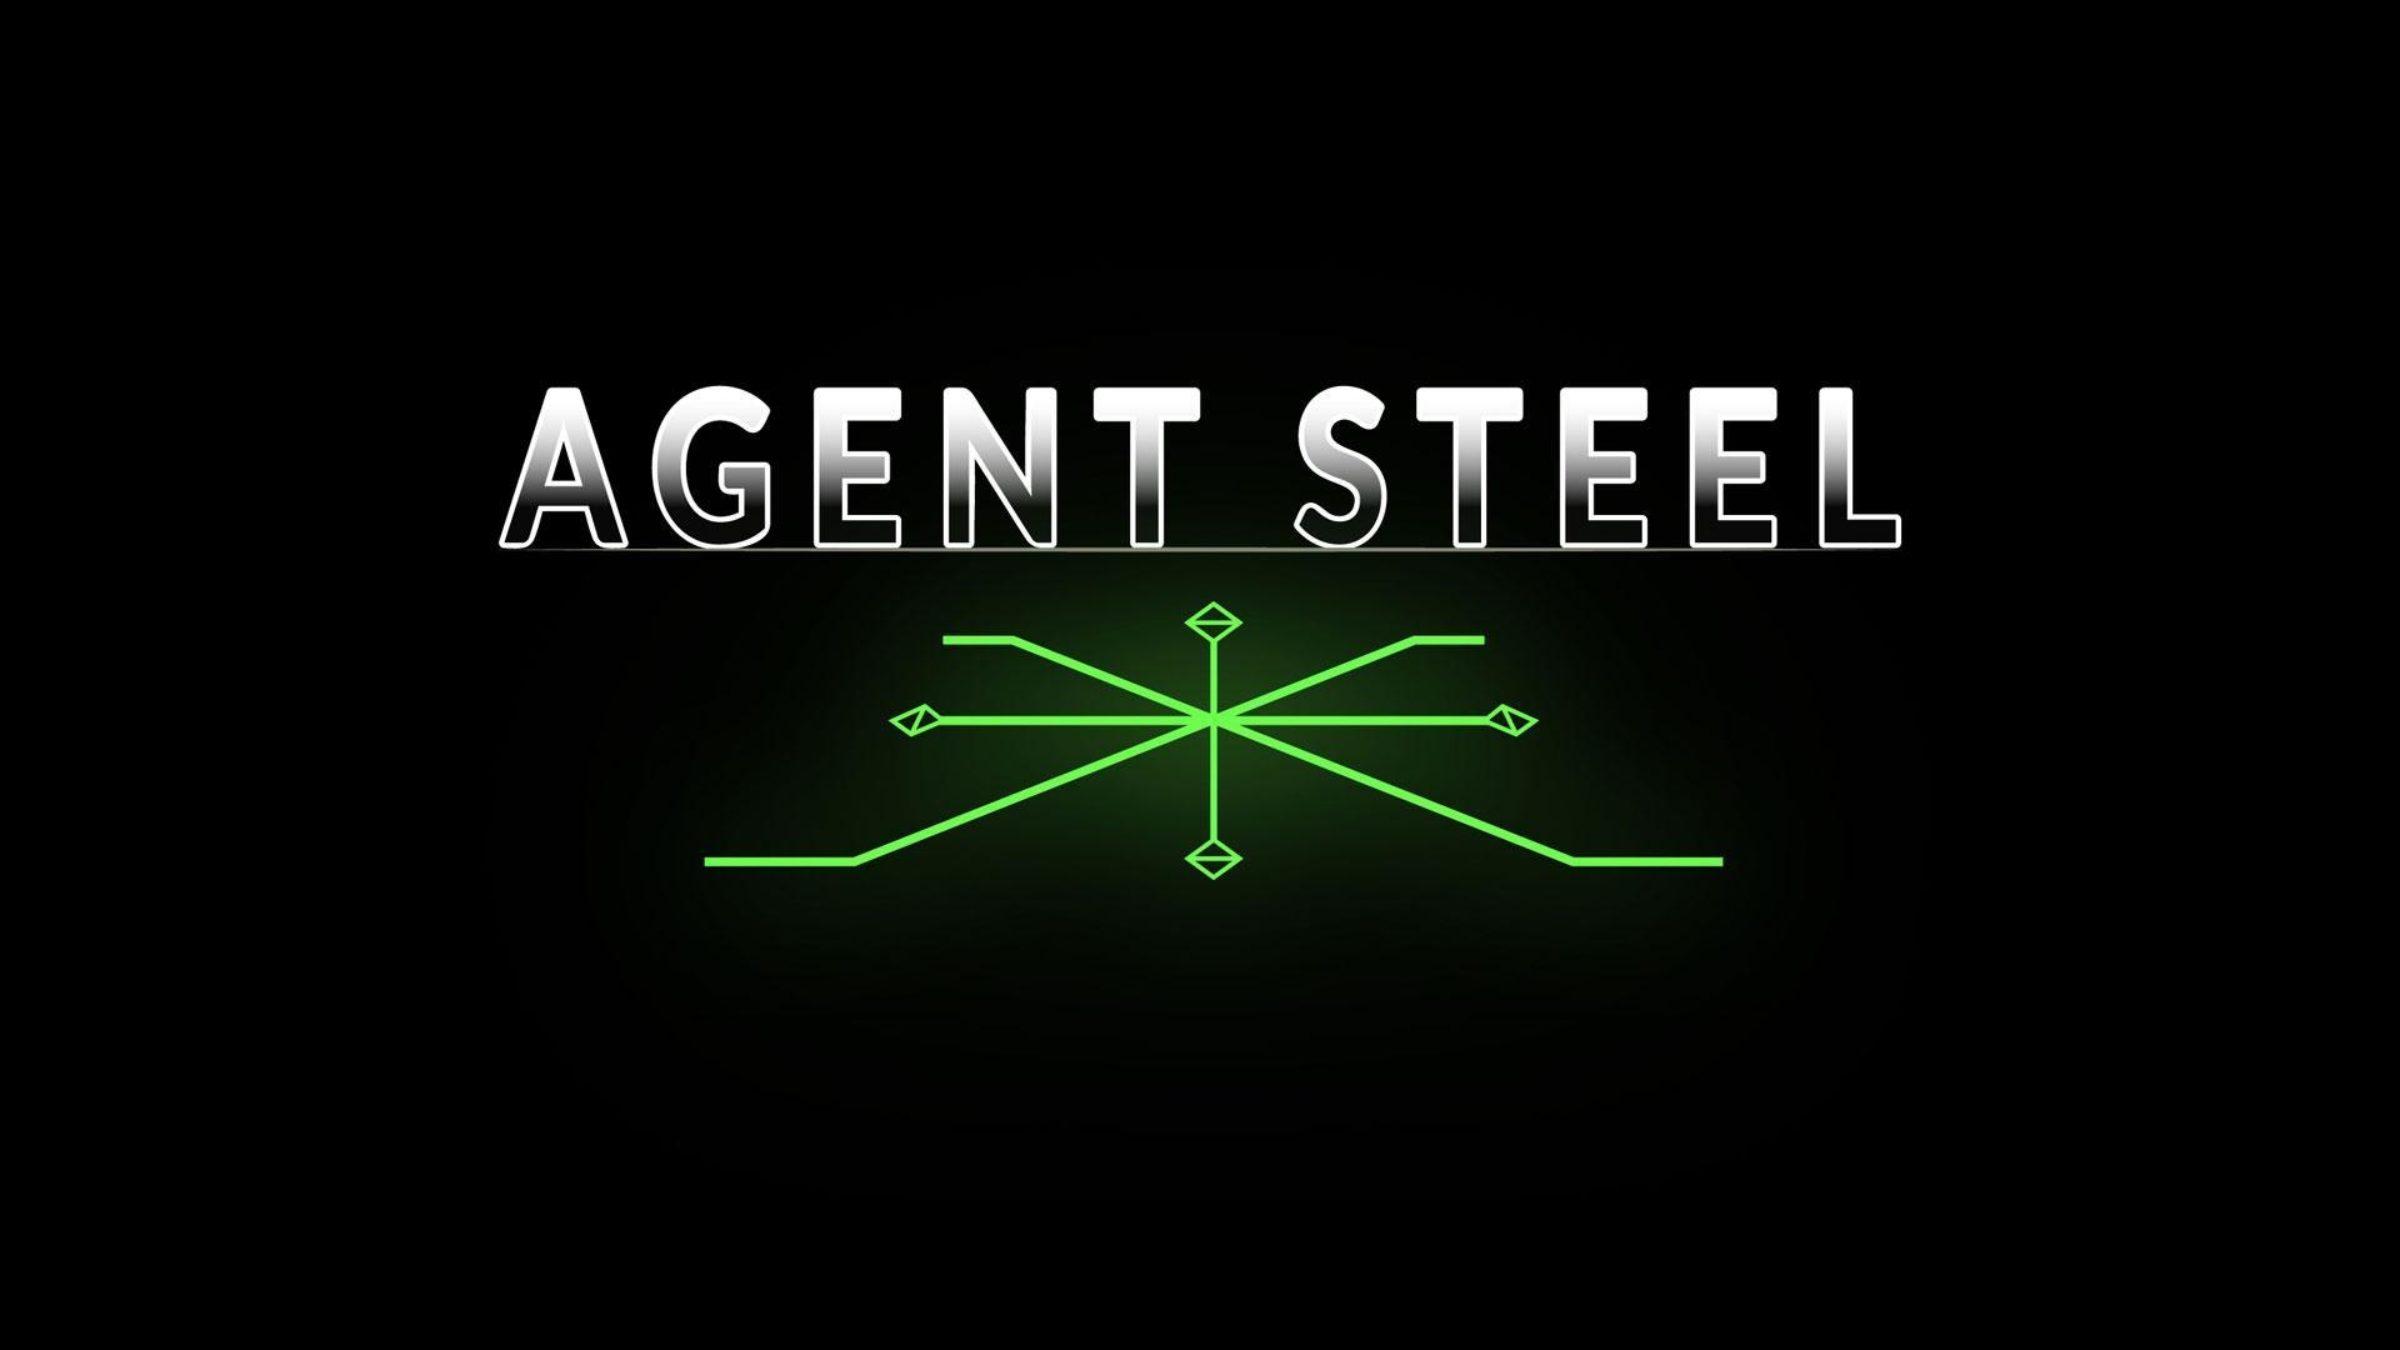 Agentsteel web 35hxg39lur